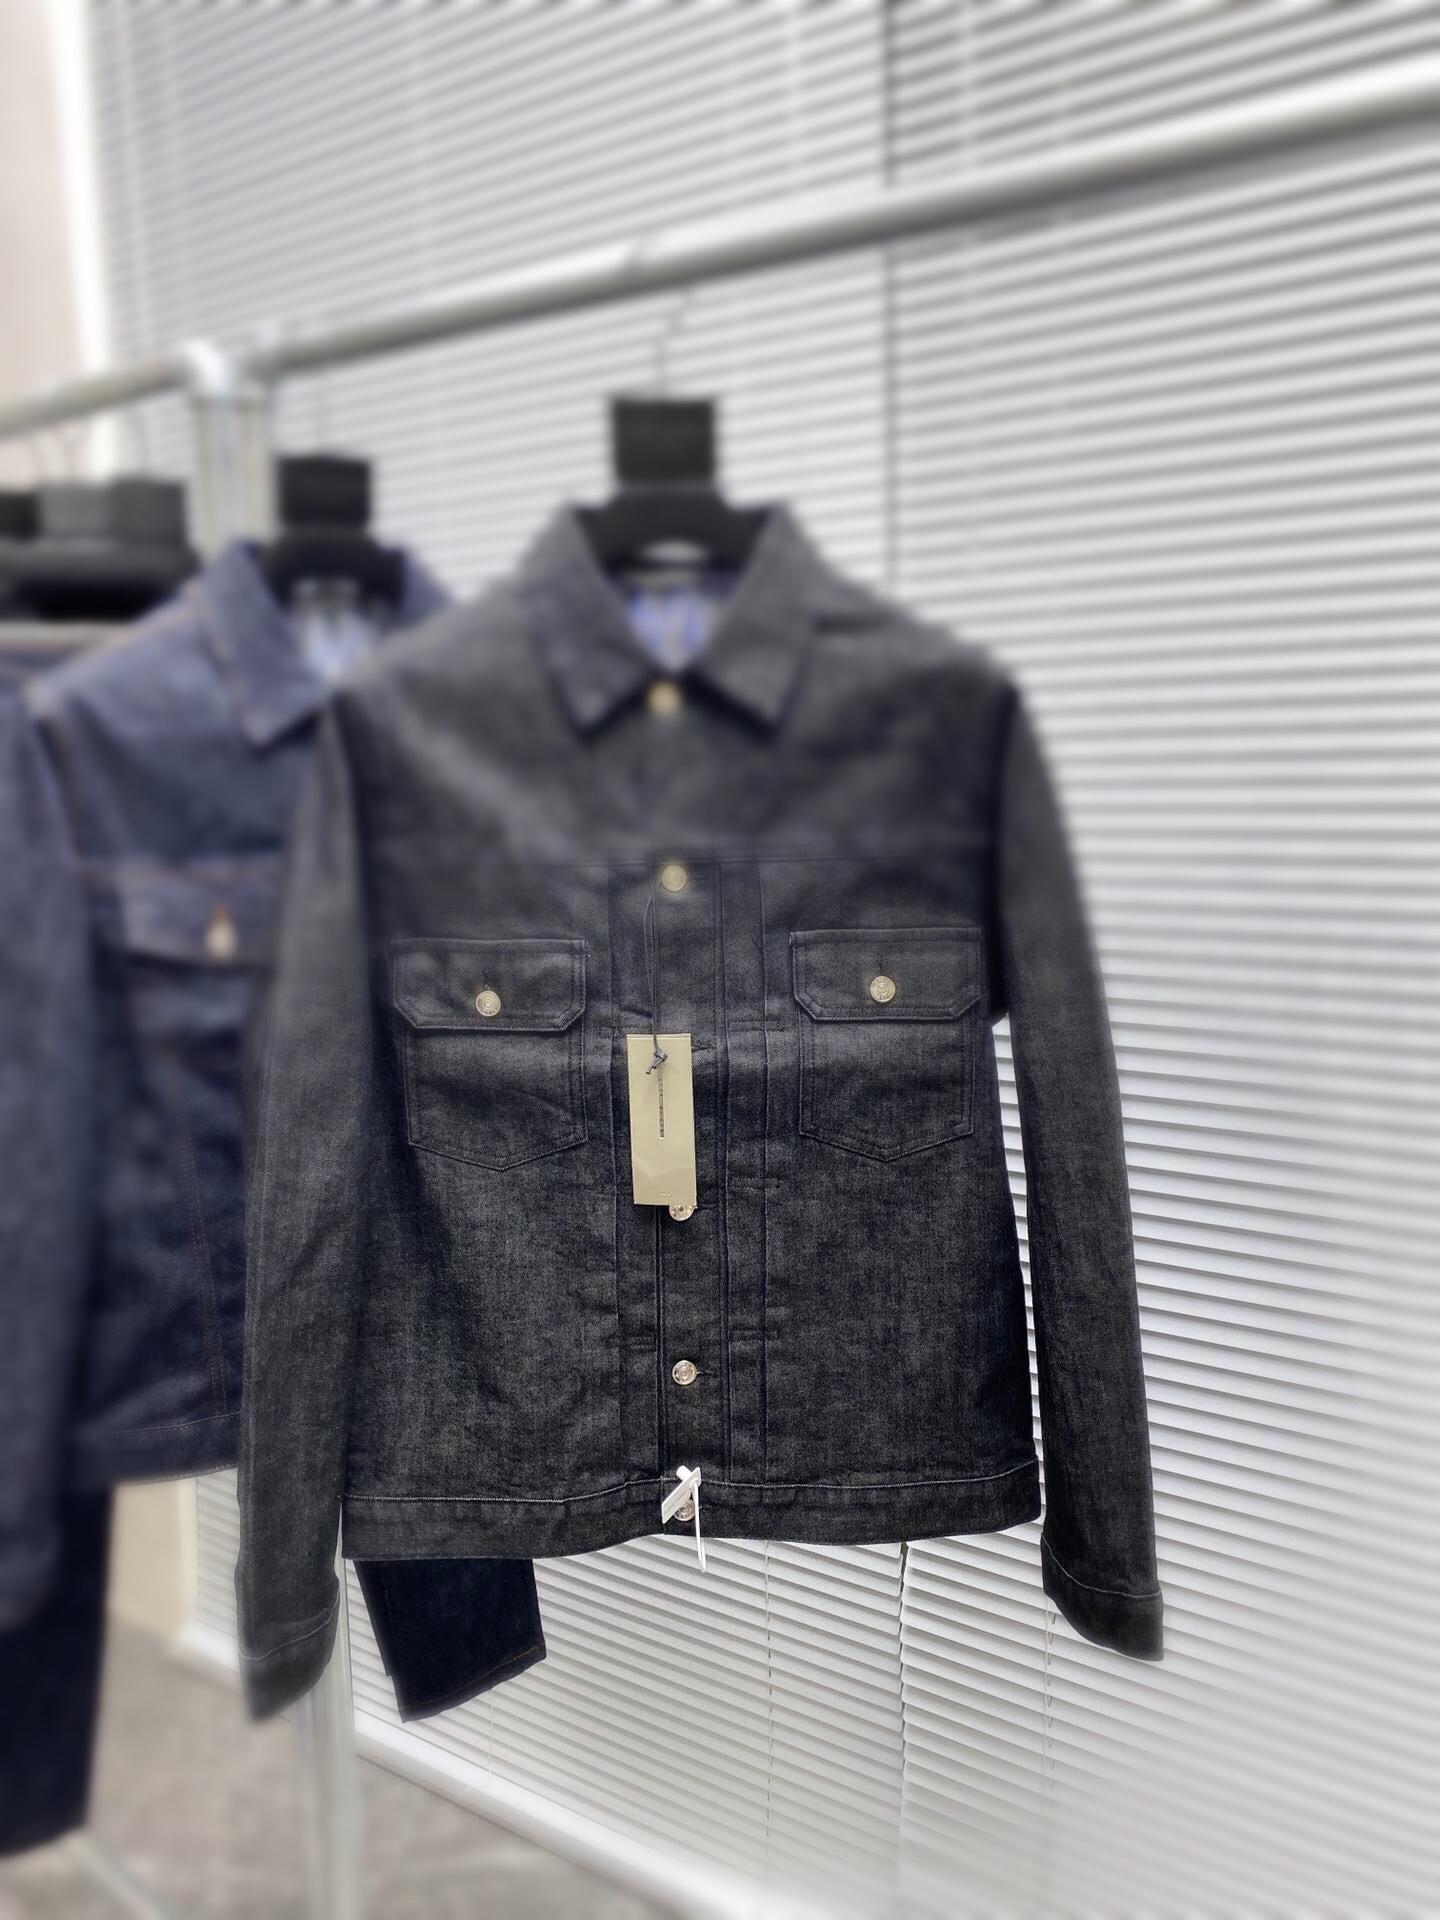 2020 paris italy jackets Casual Street Fashion Pockets Warm Men Women Couple Outwear free ship 0390